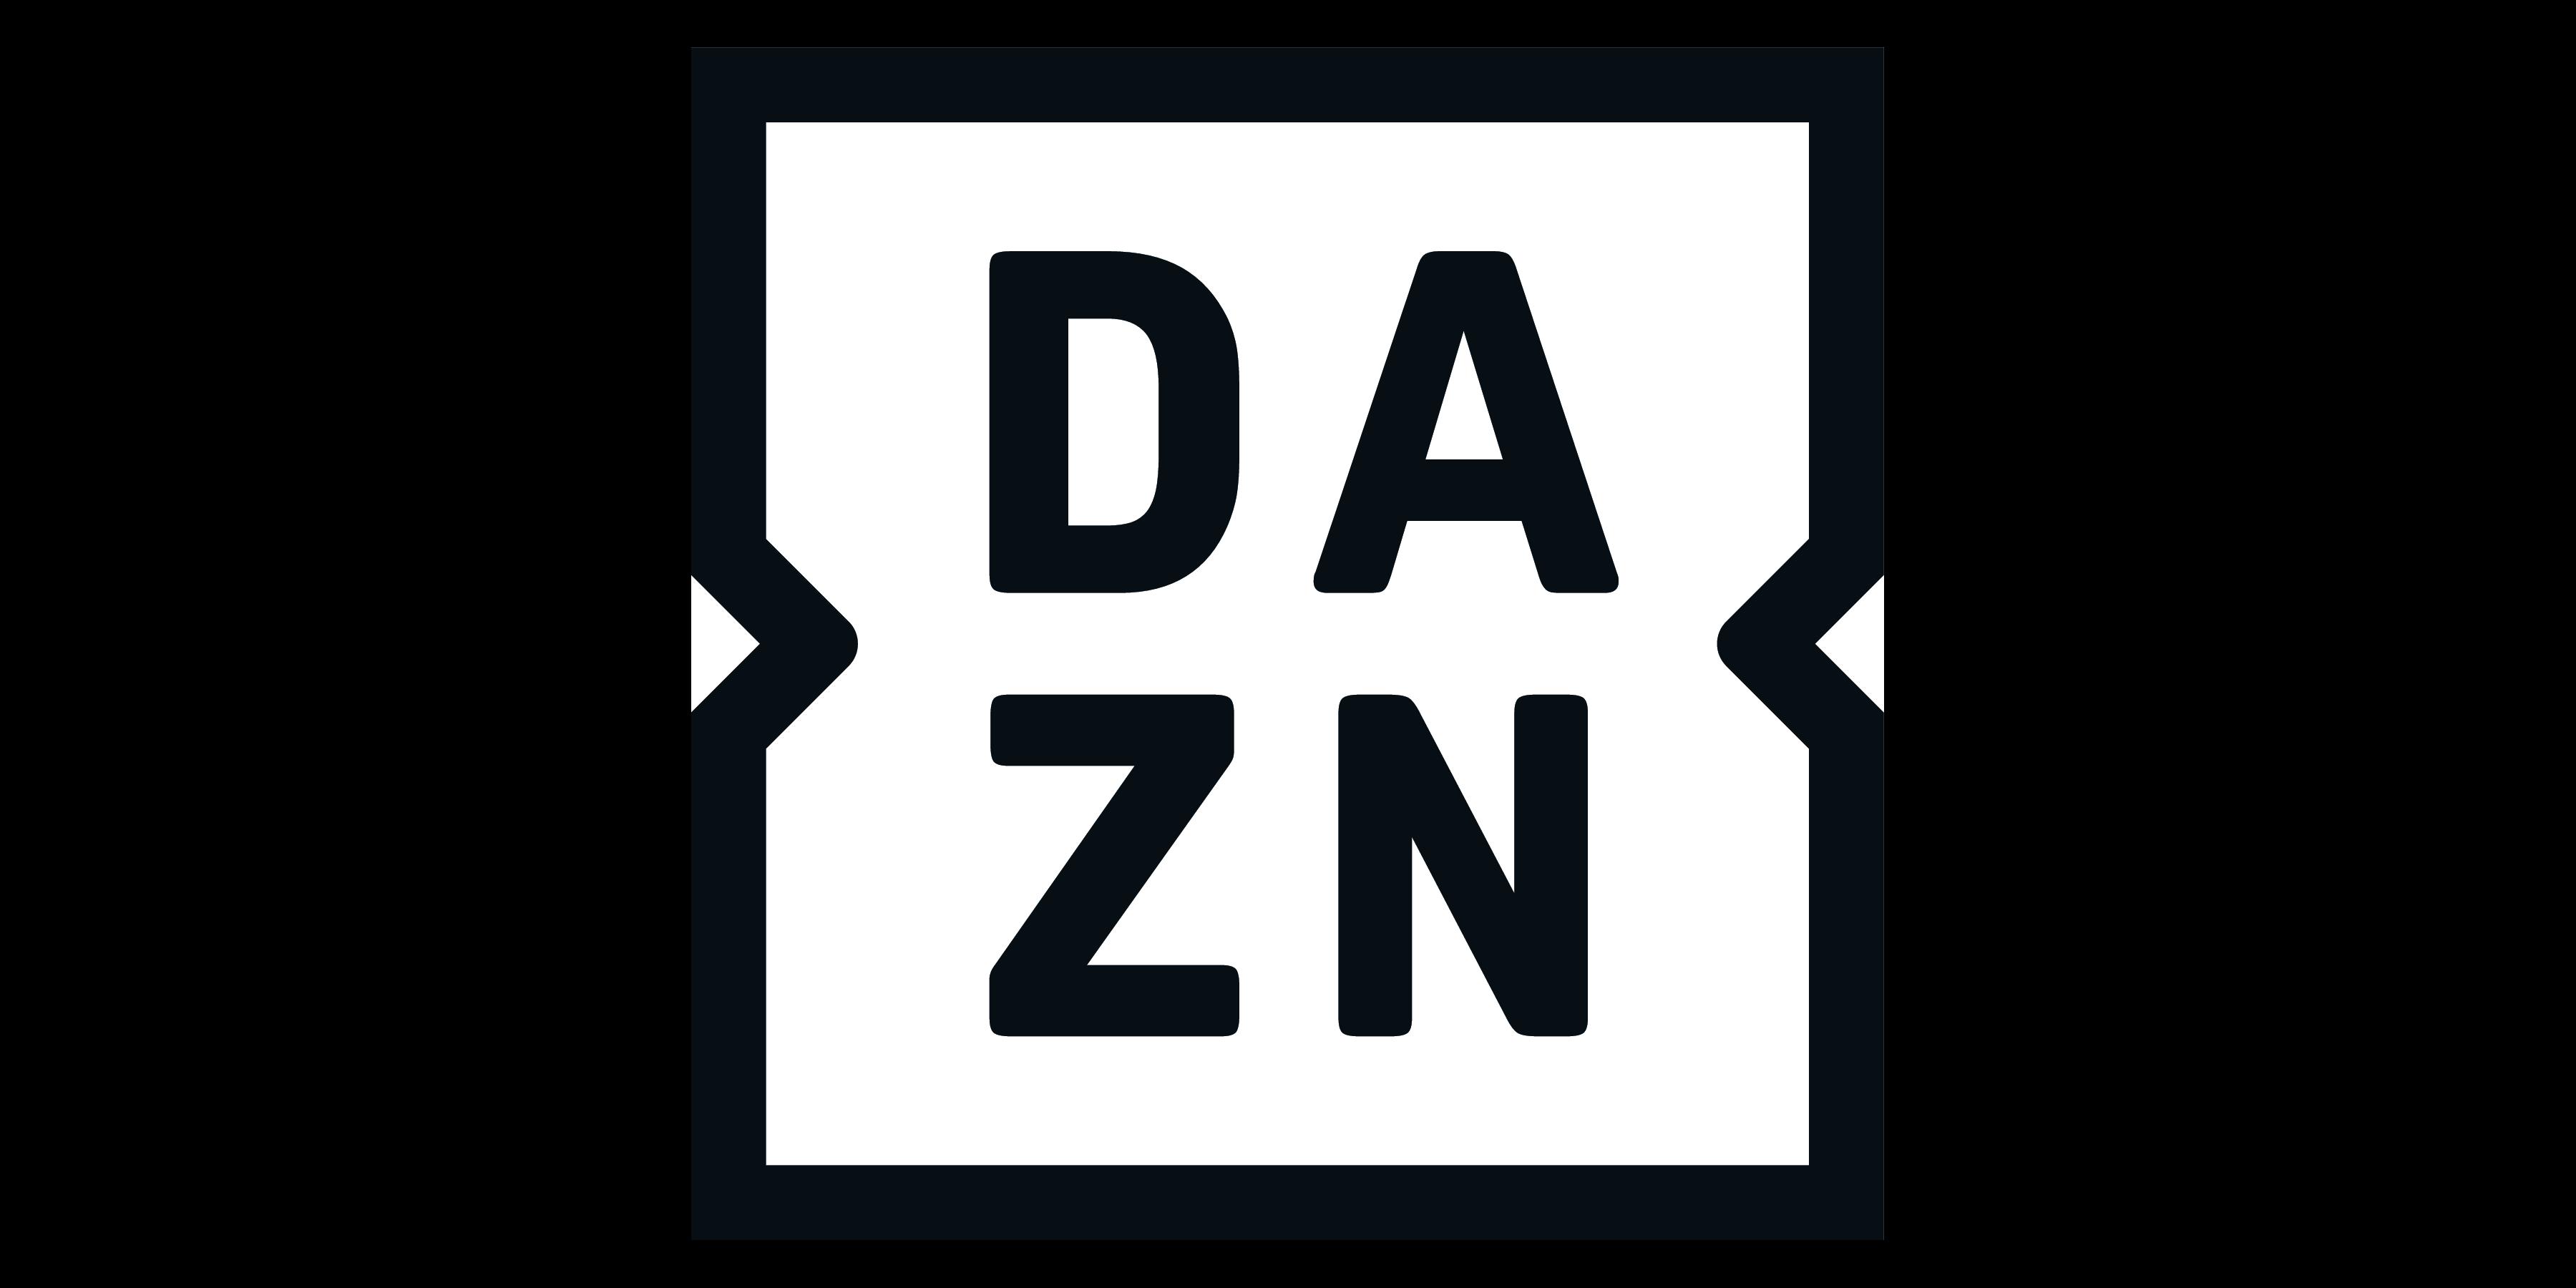 DAZN – UEFA Champions League